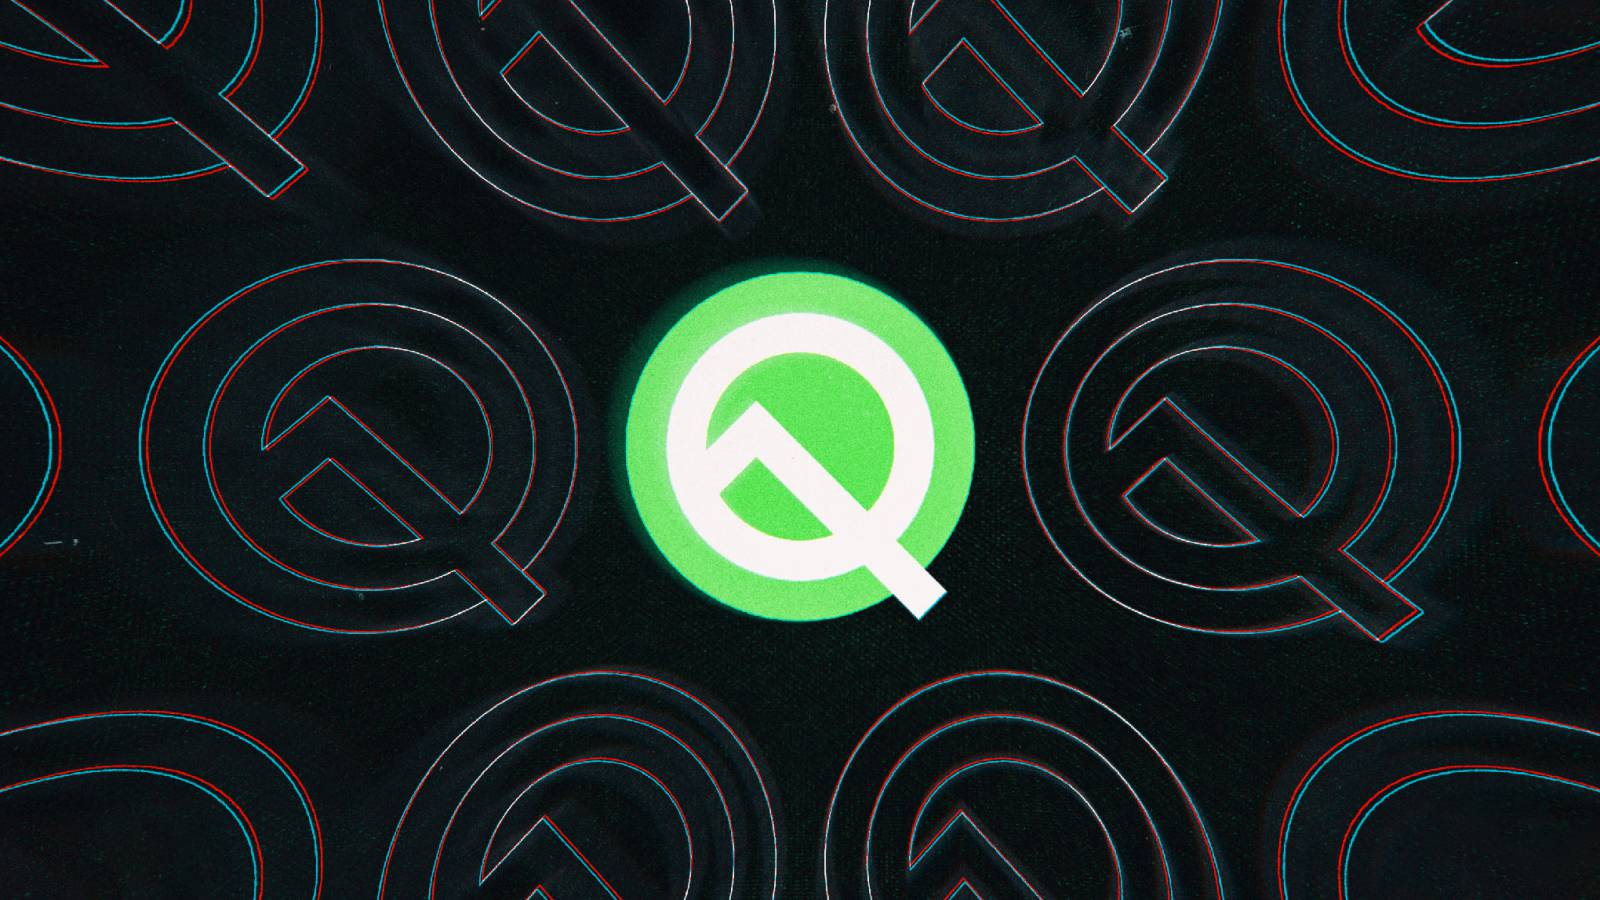 Android Q autonomie